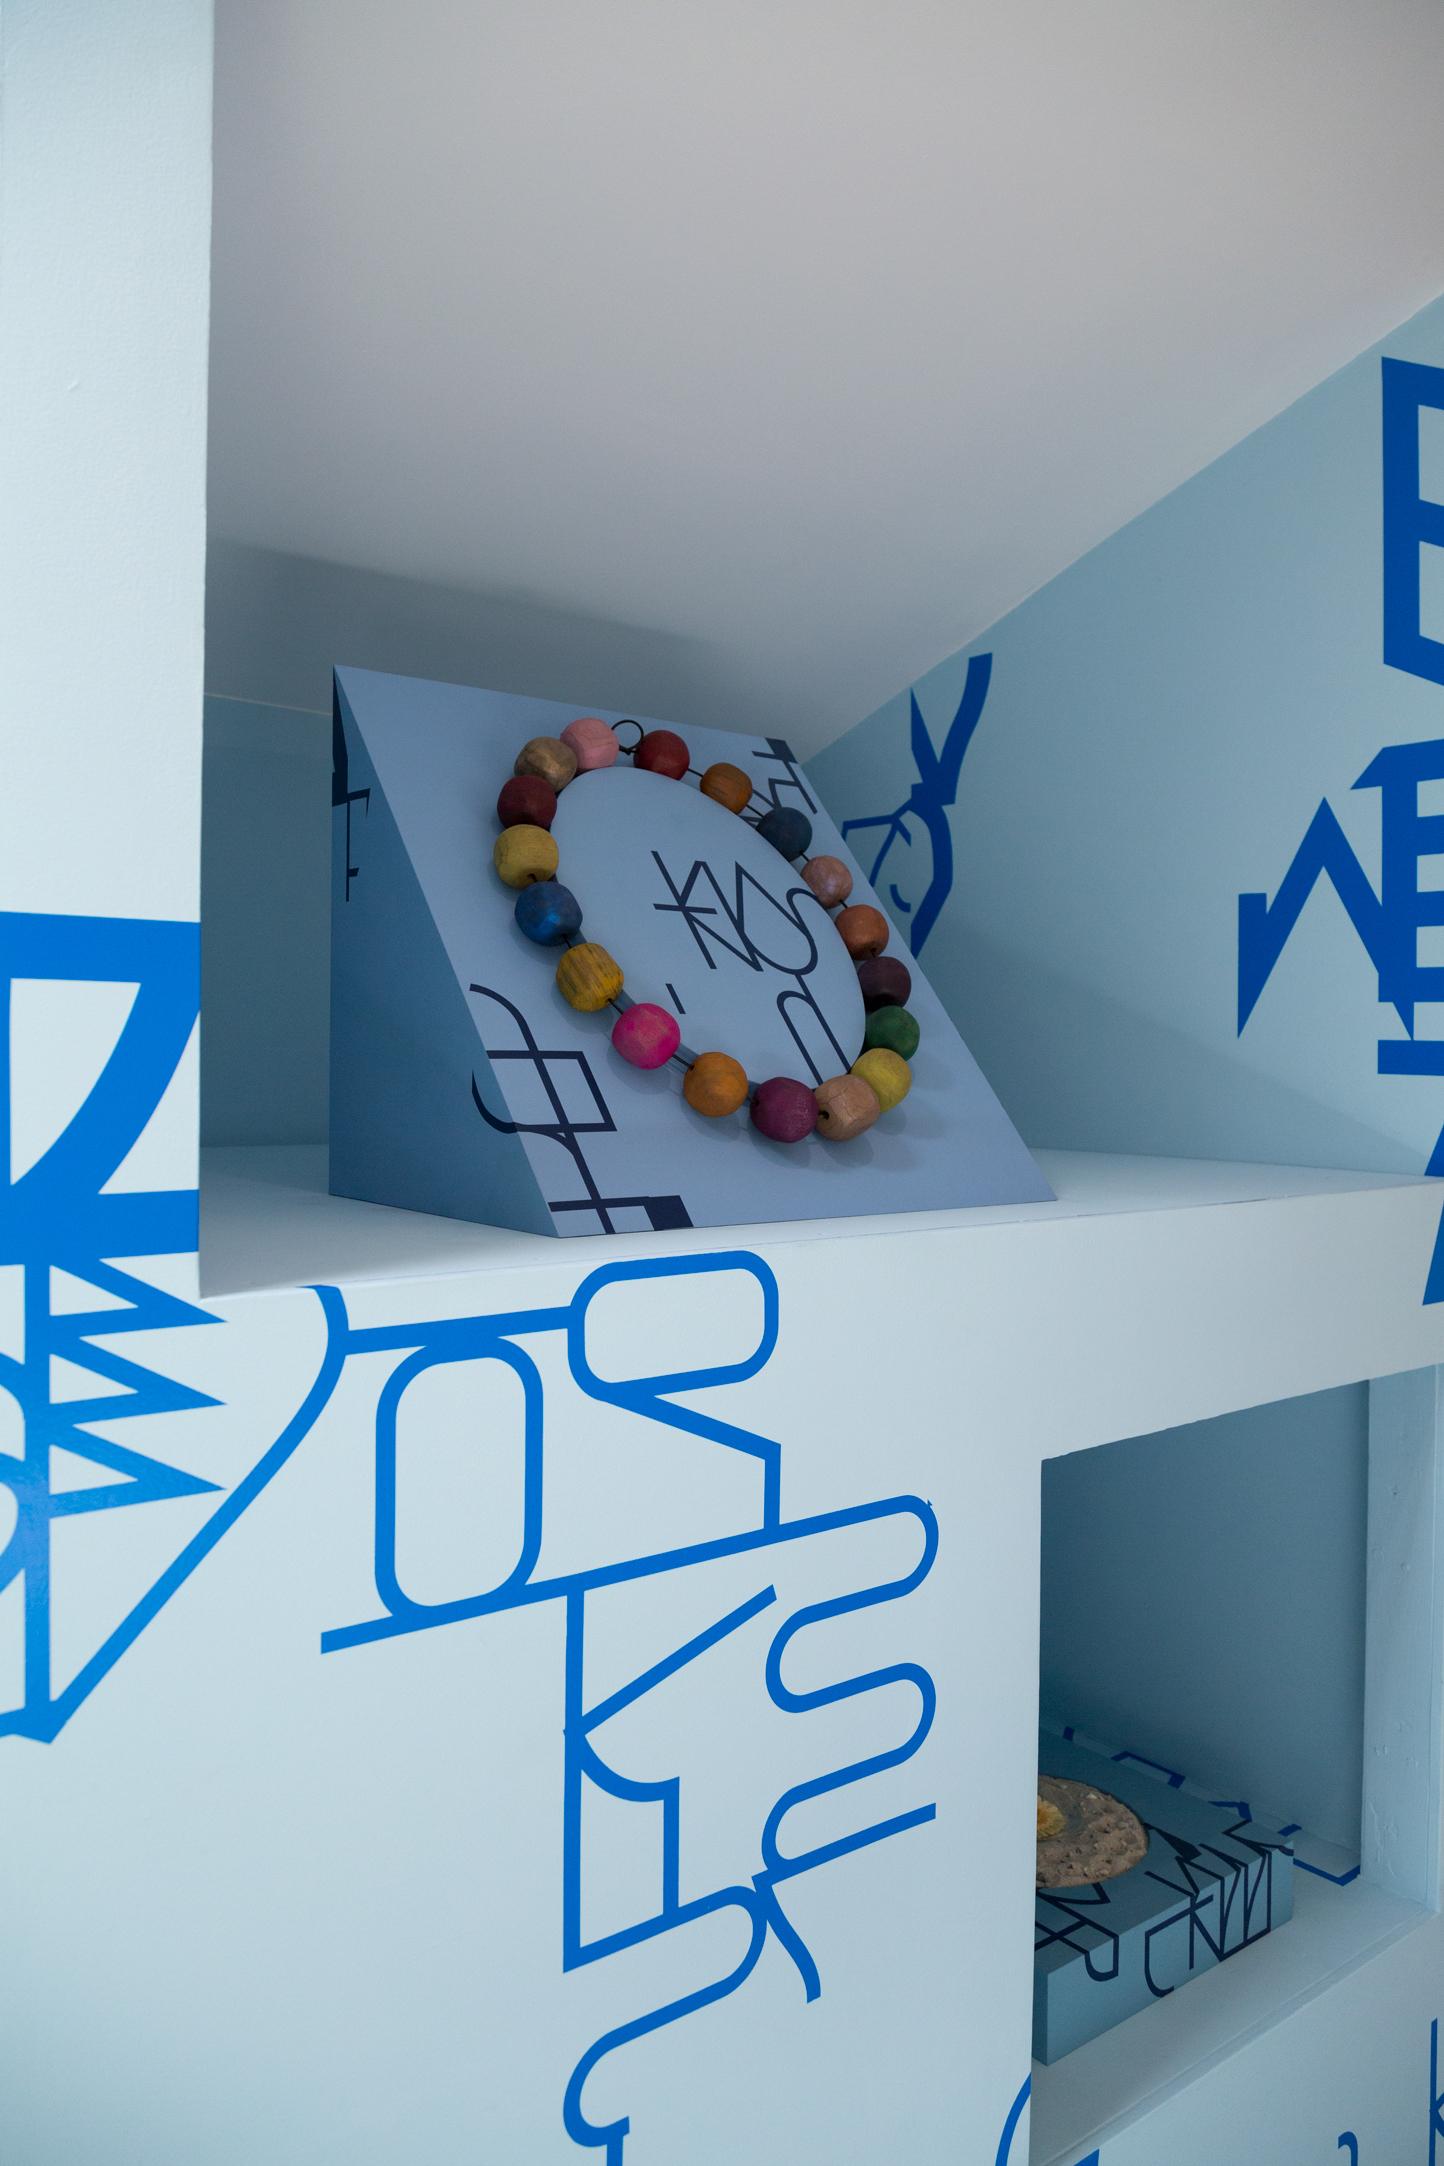 Big Blue Bees  vinyl wall installation, custom shelves, Necklace, Books, Sand, Flower, Edition of 10, 2017